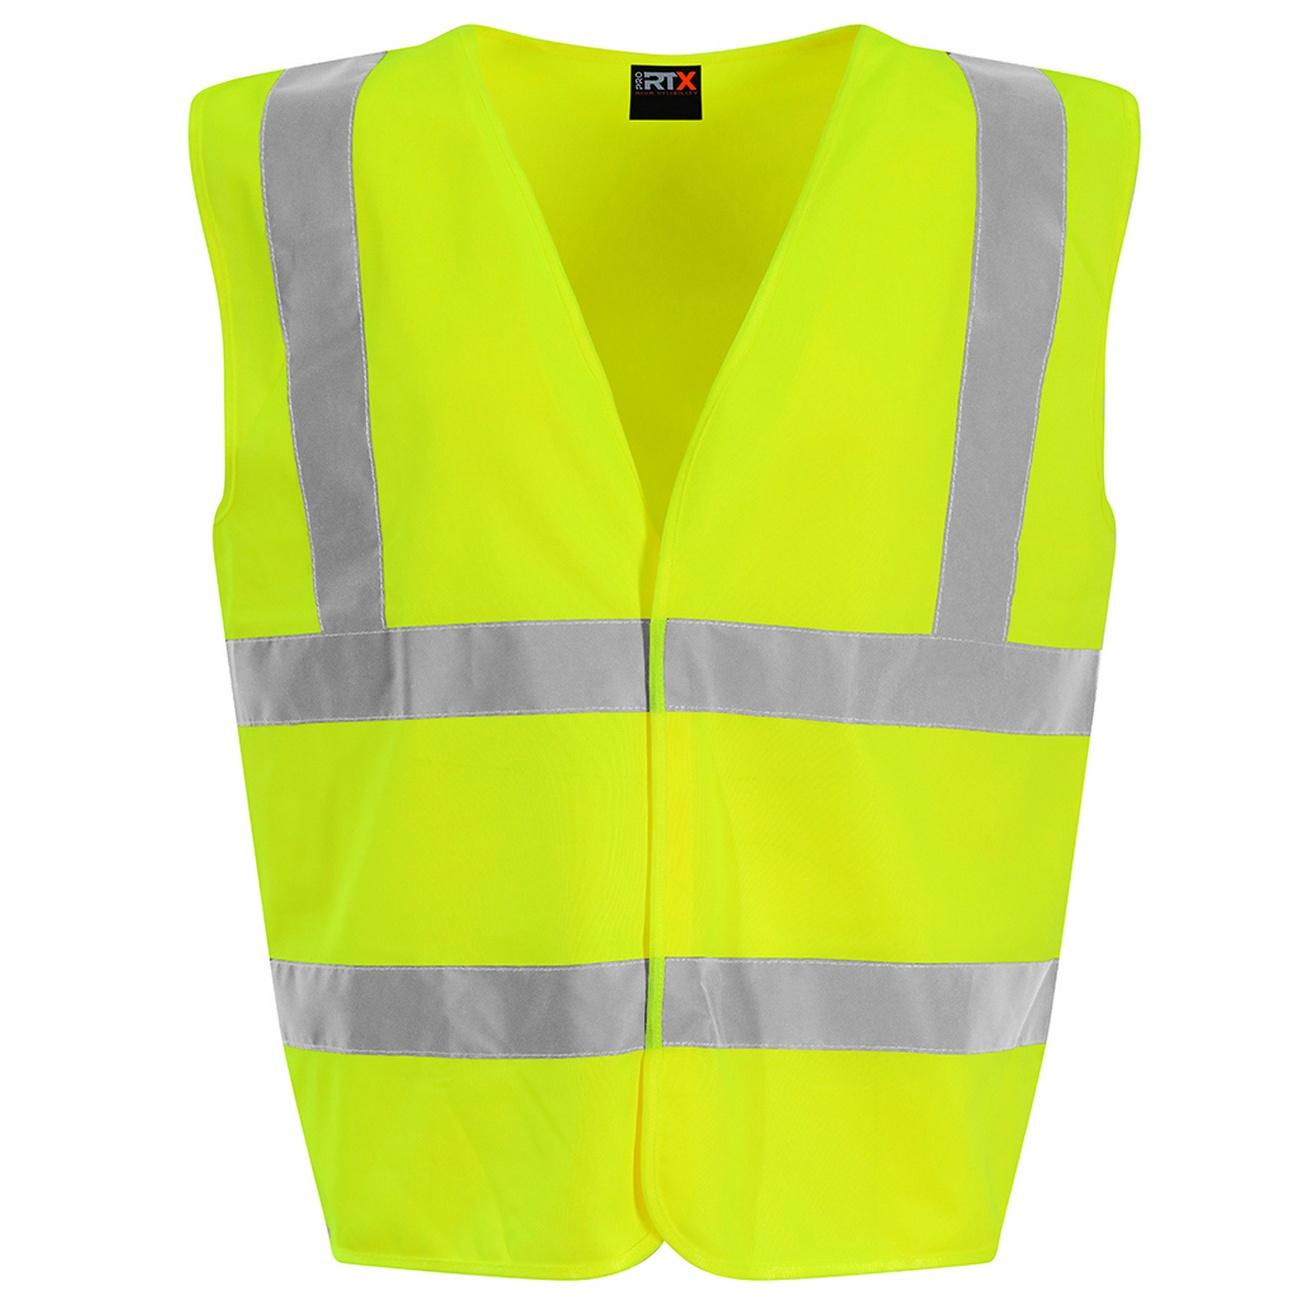 PRO RTX High Visibility Childrens/Kids Waistcoat (S) (Yellow)